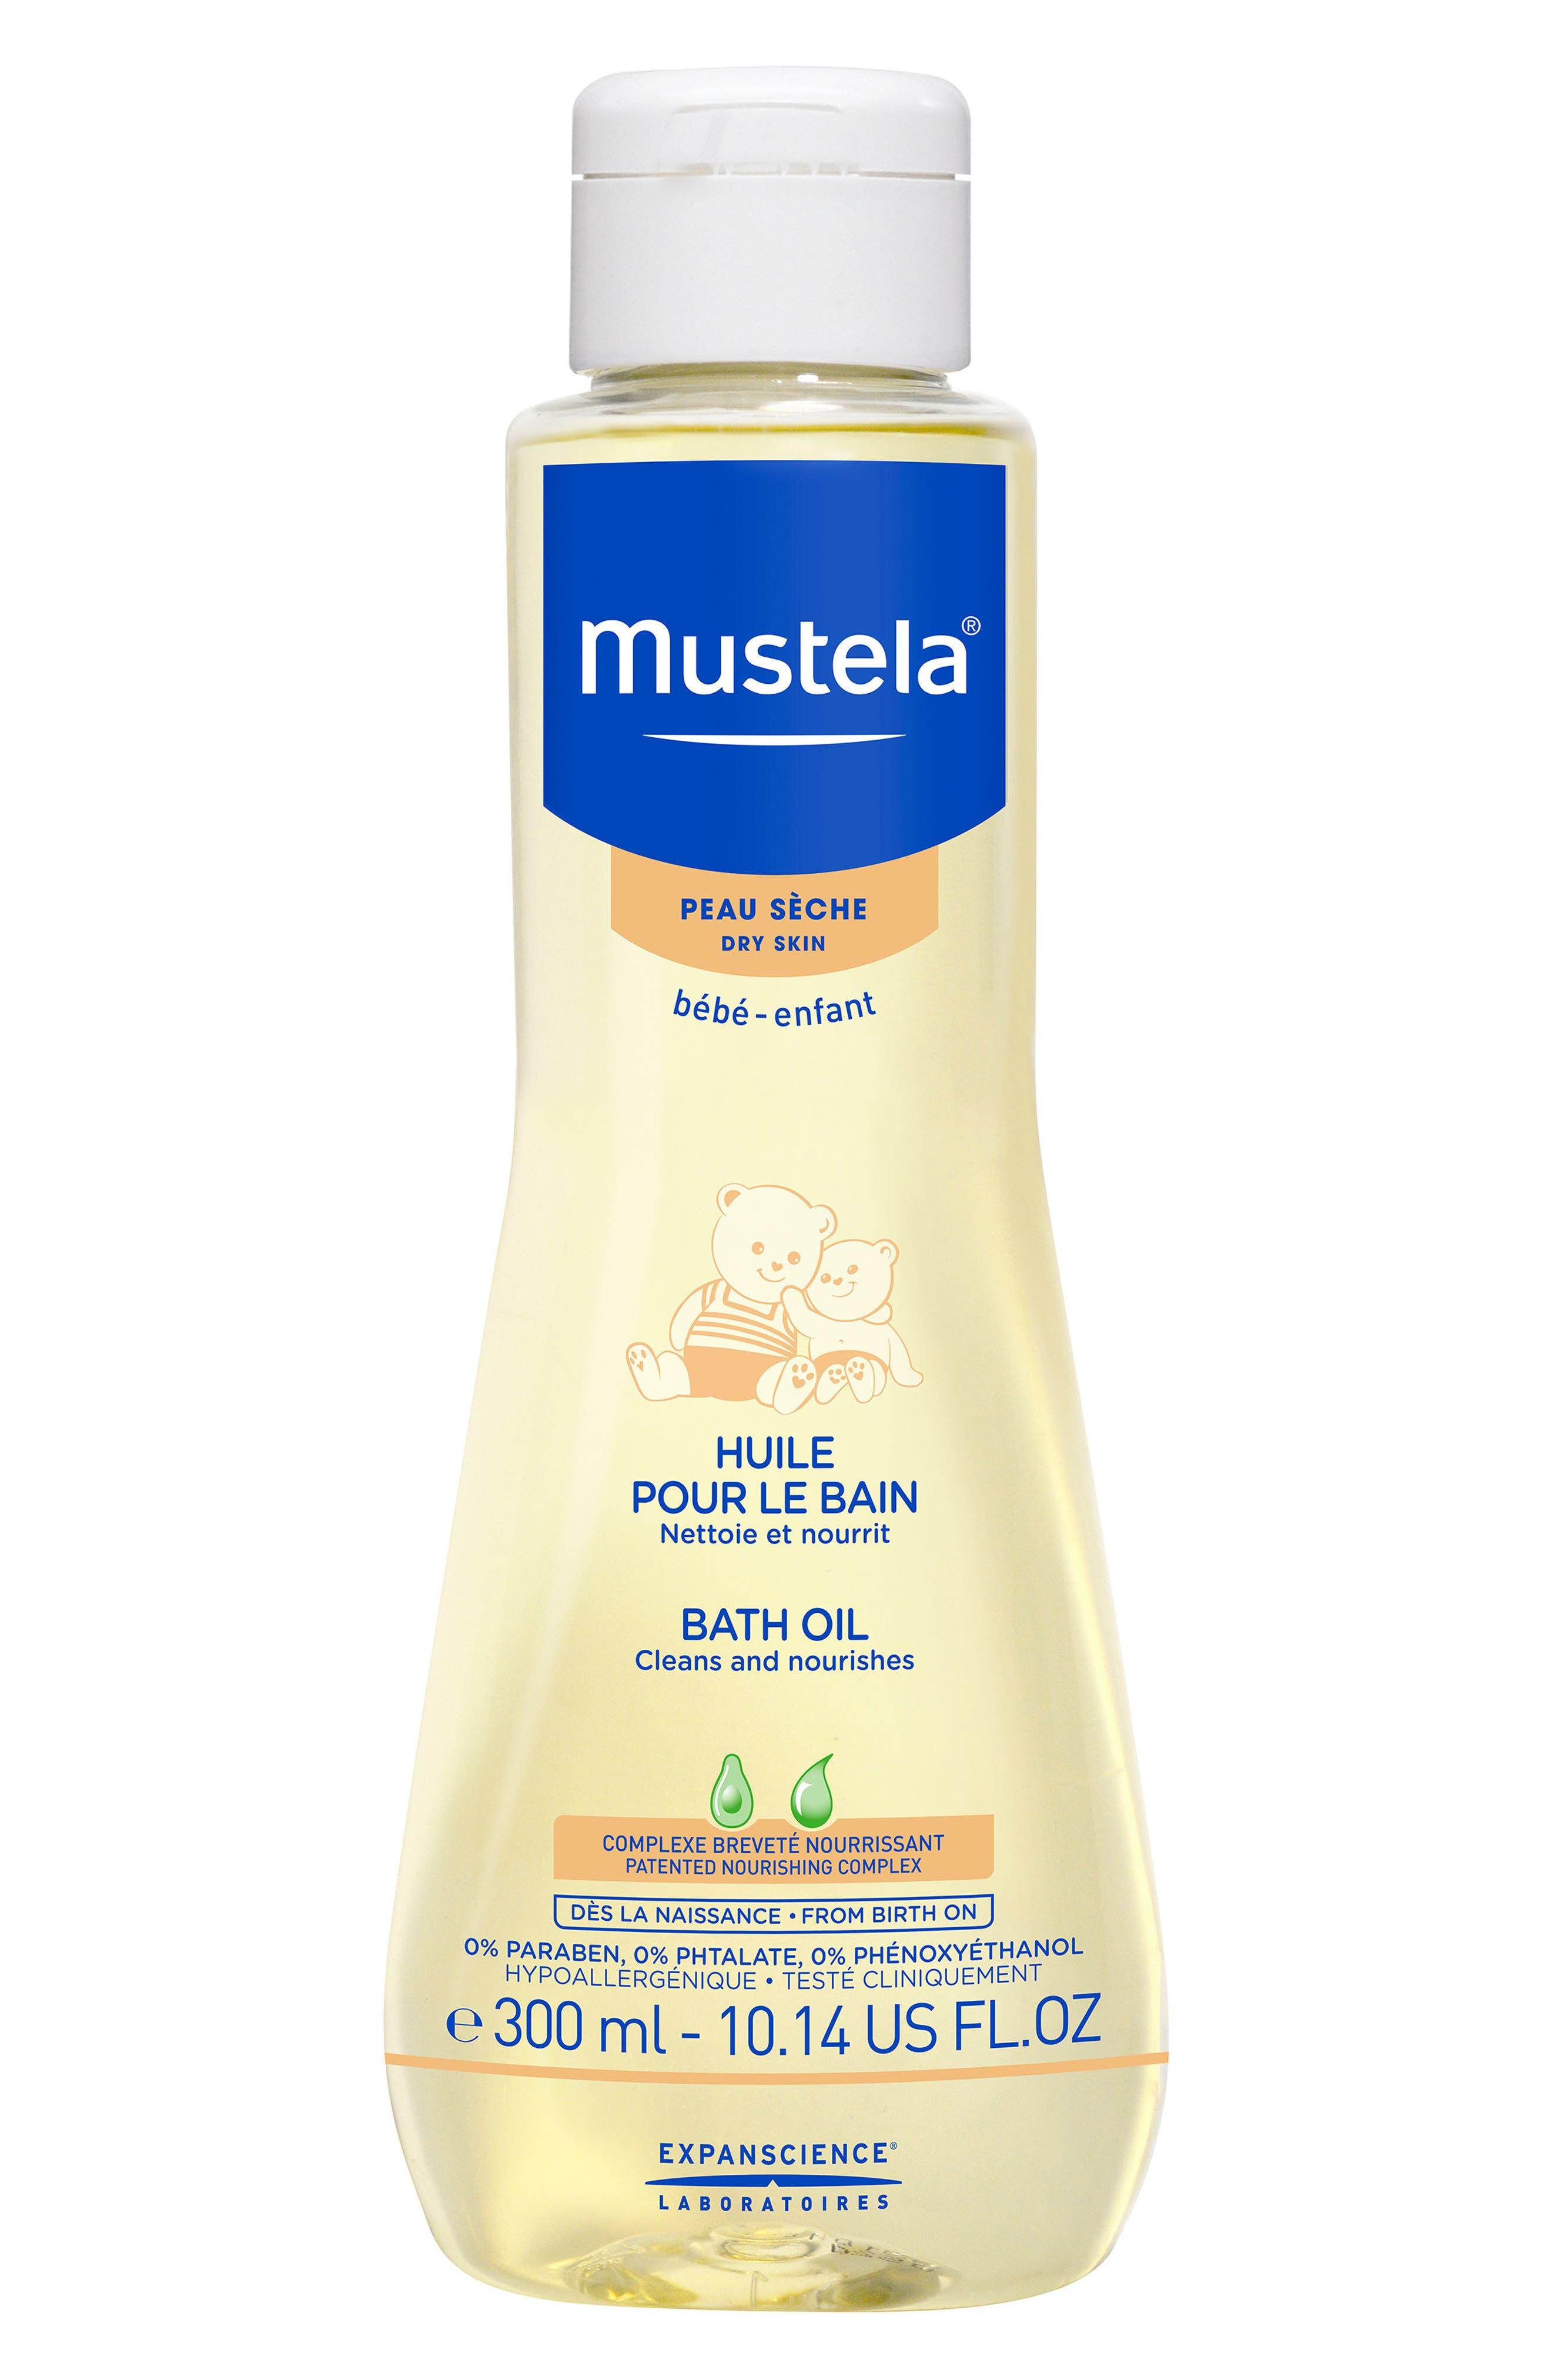 Mustela® Bath Oil for Dry Skin